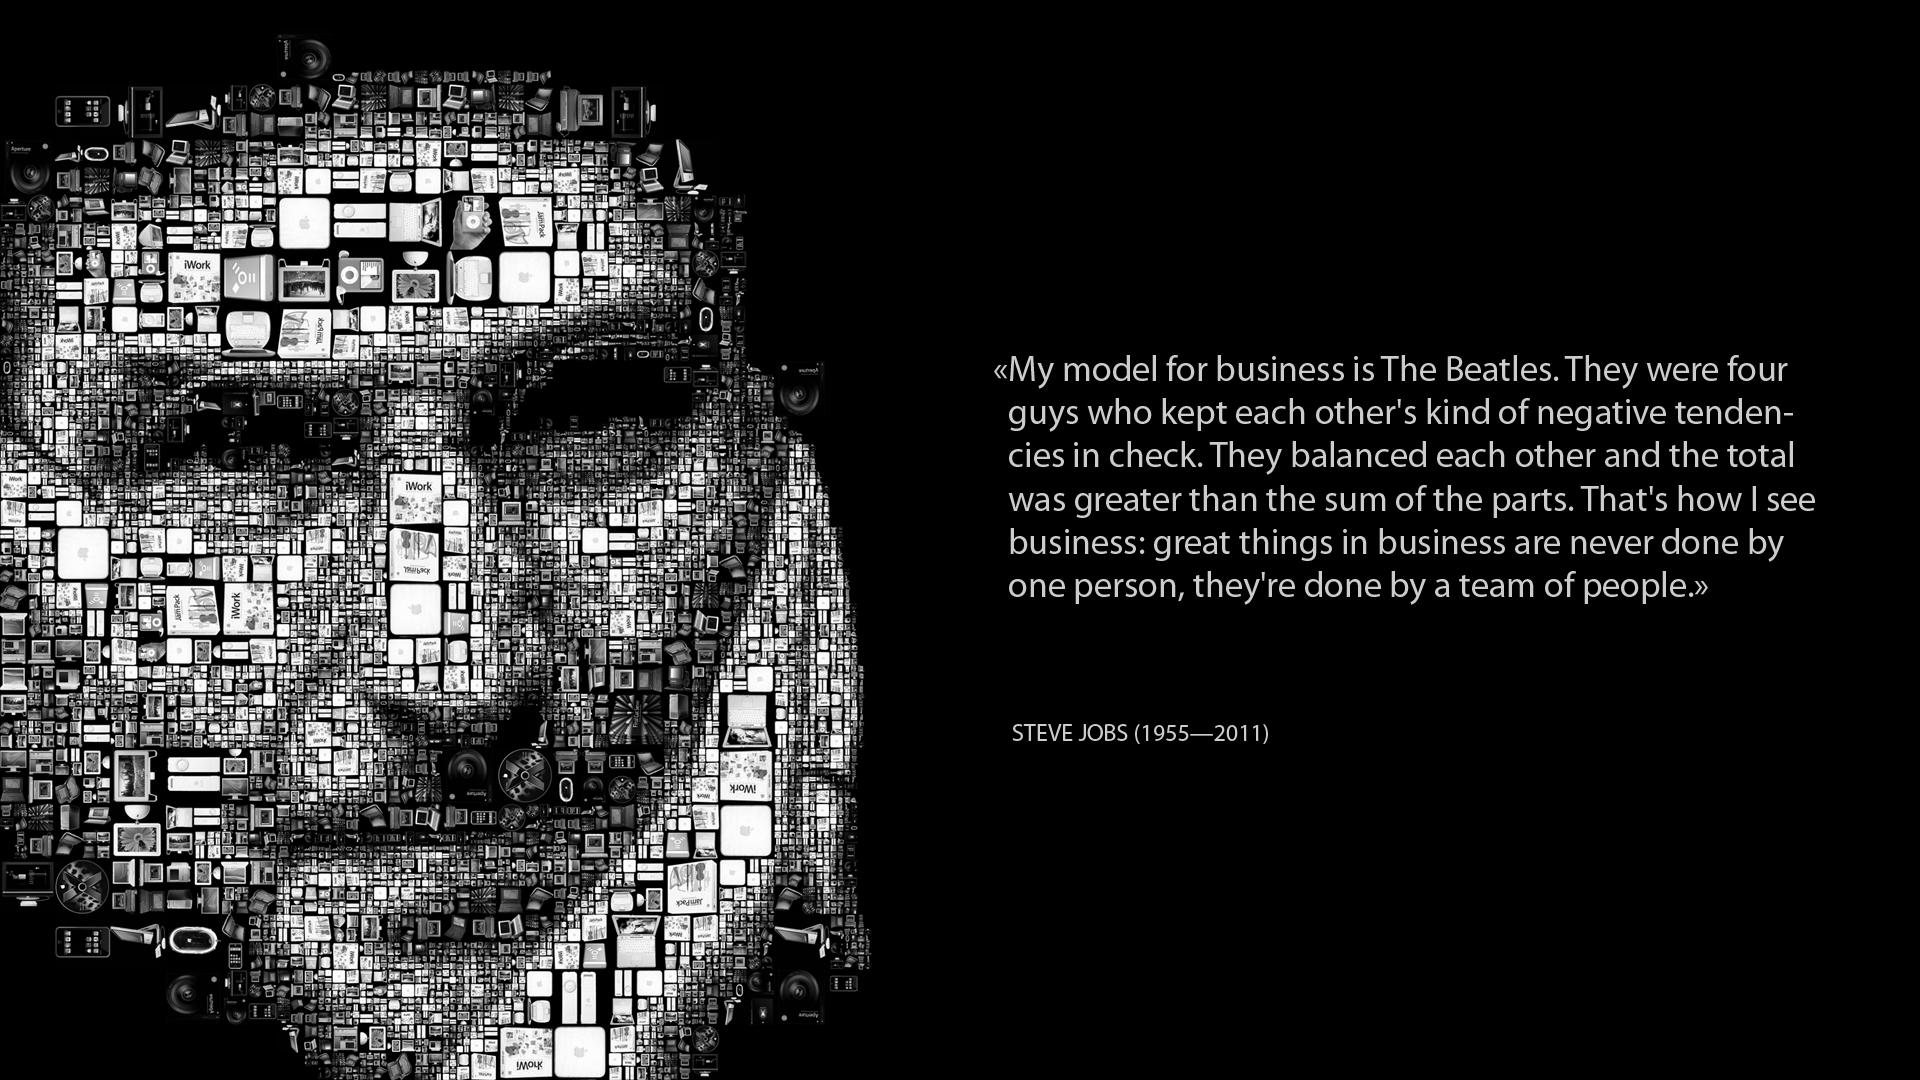 Wallpaper Quotes Desktop Images